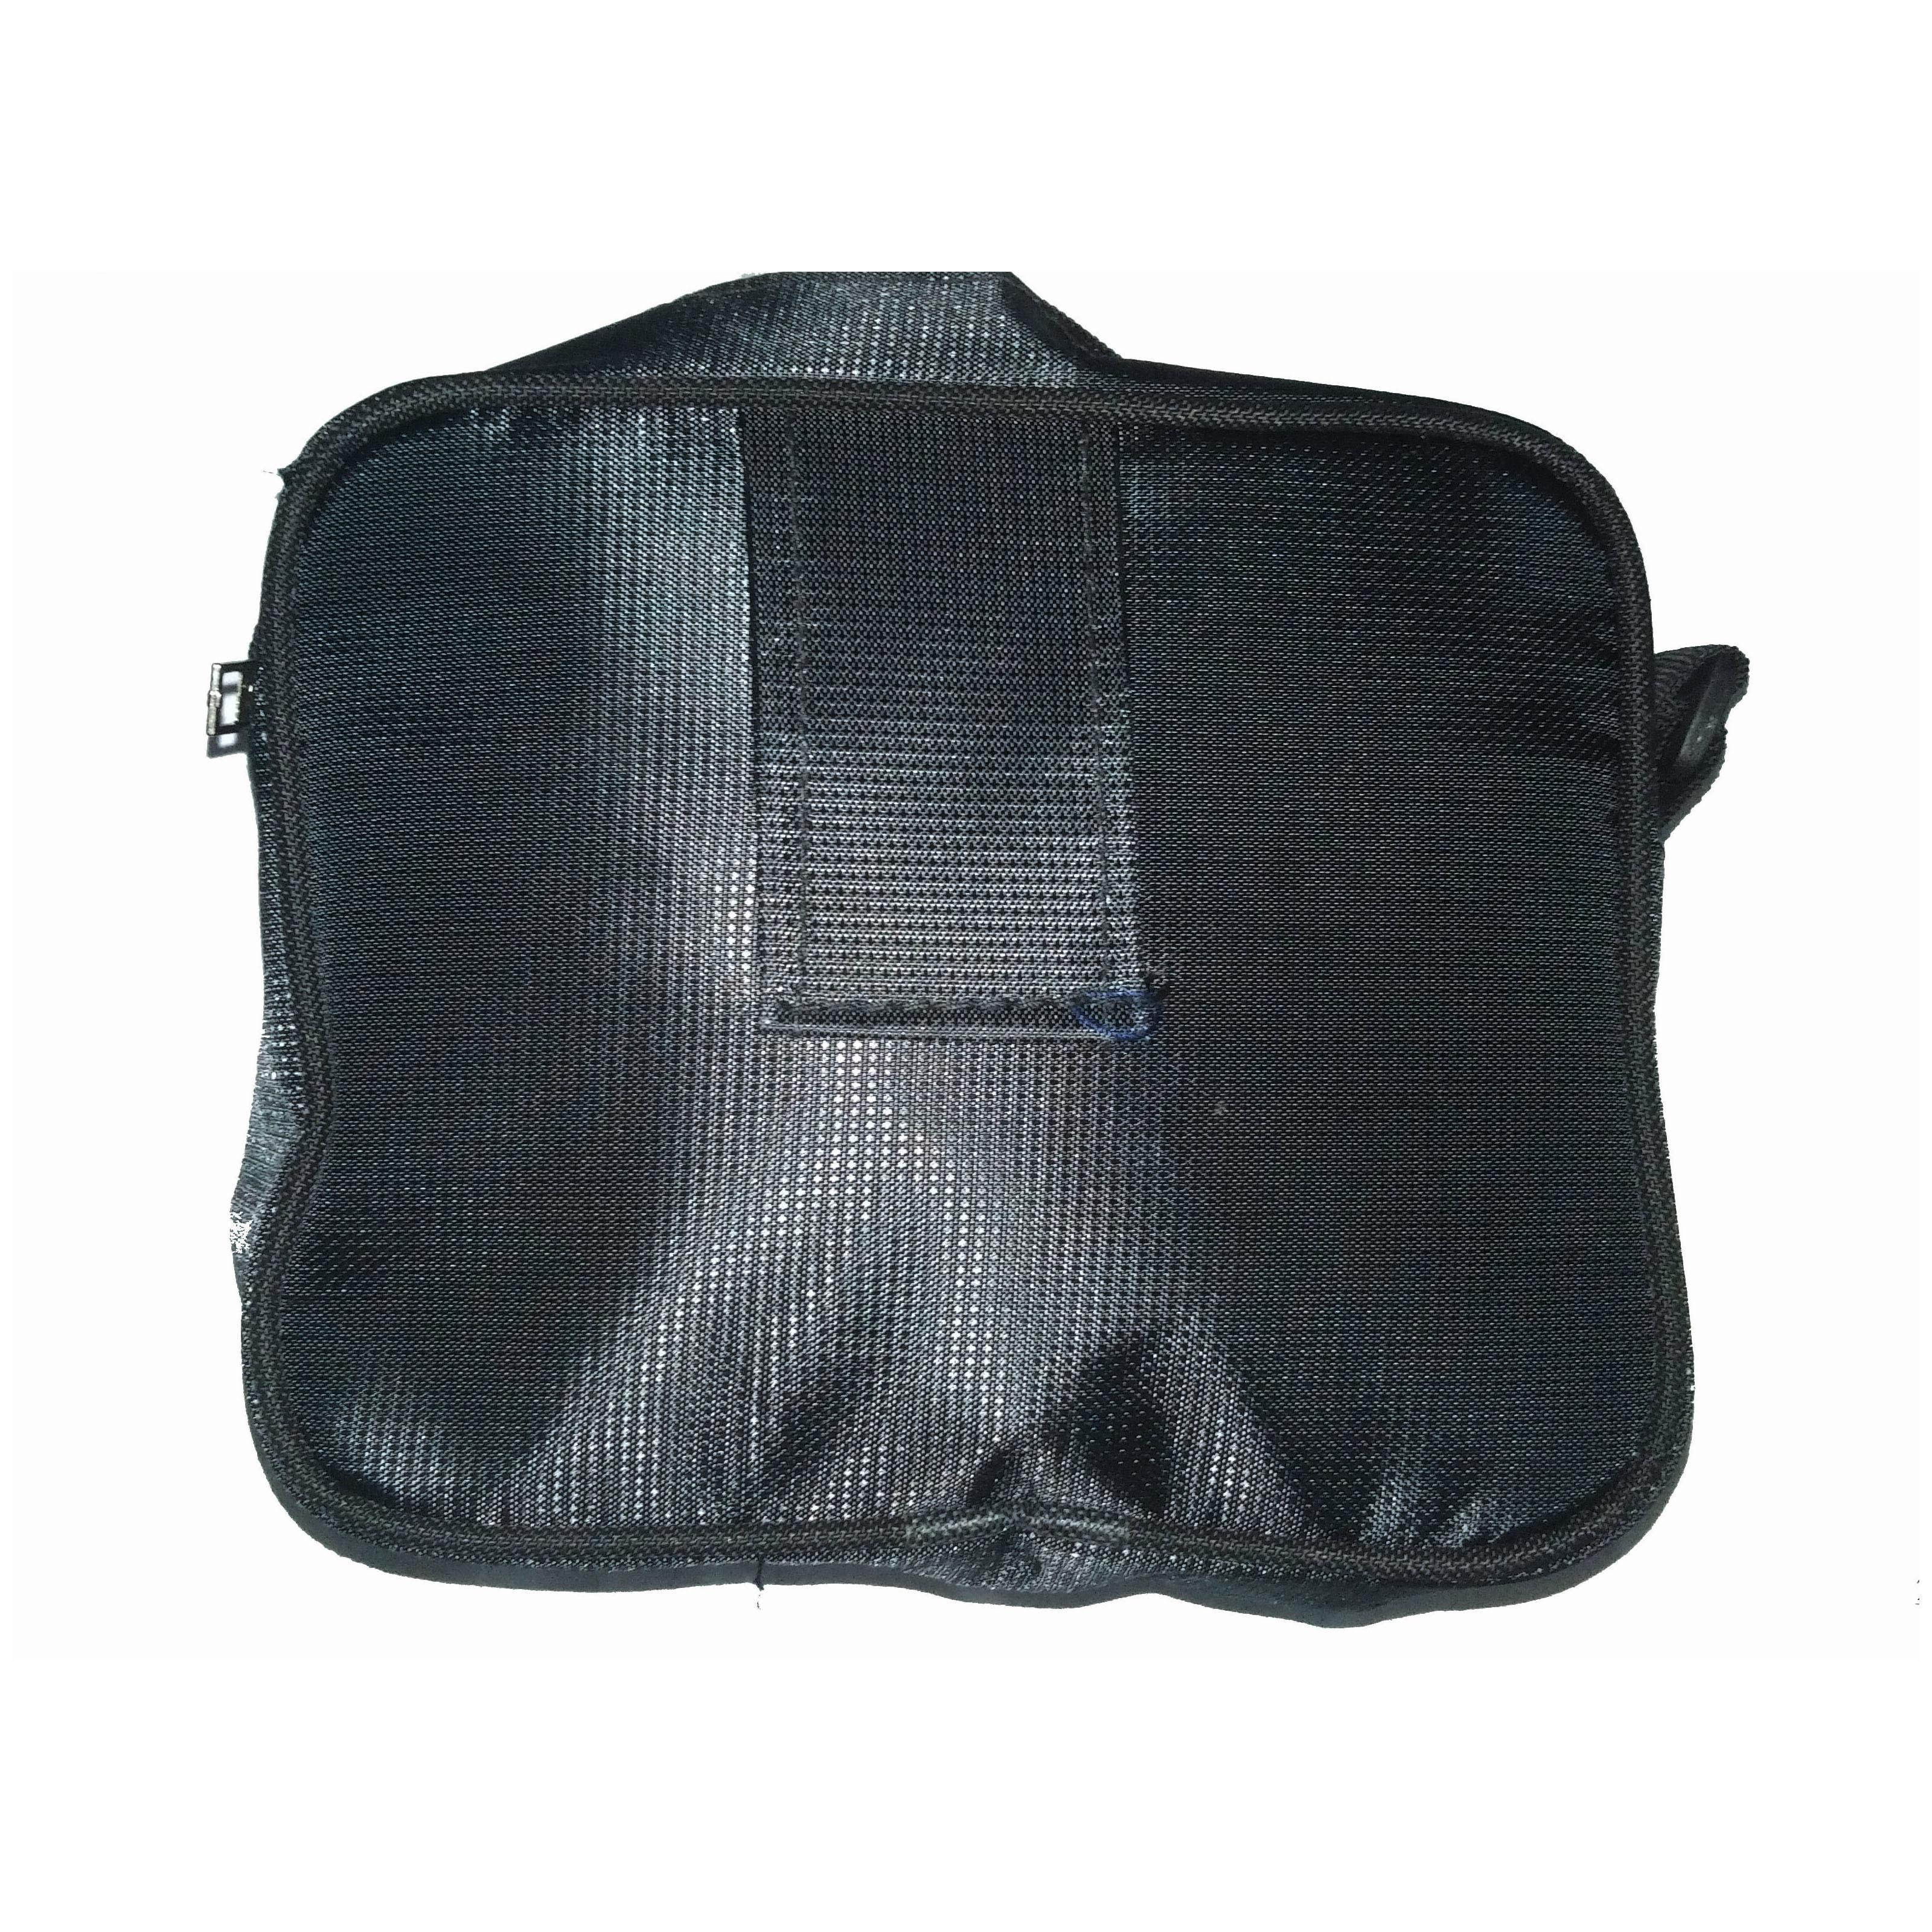 Passport Hand Bags